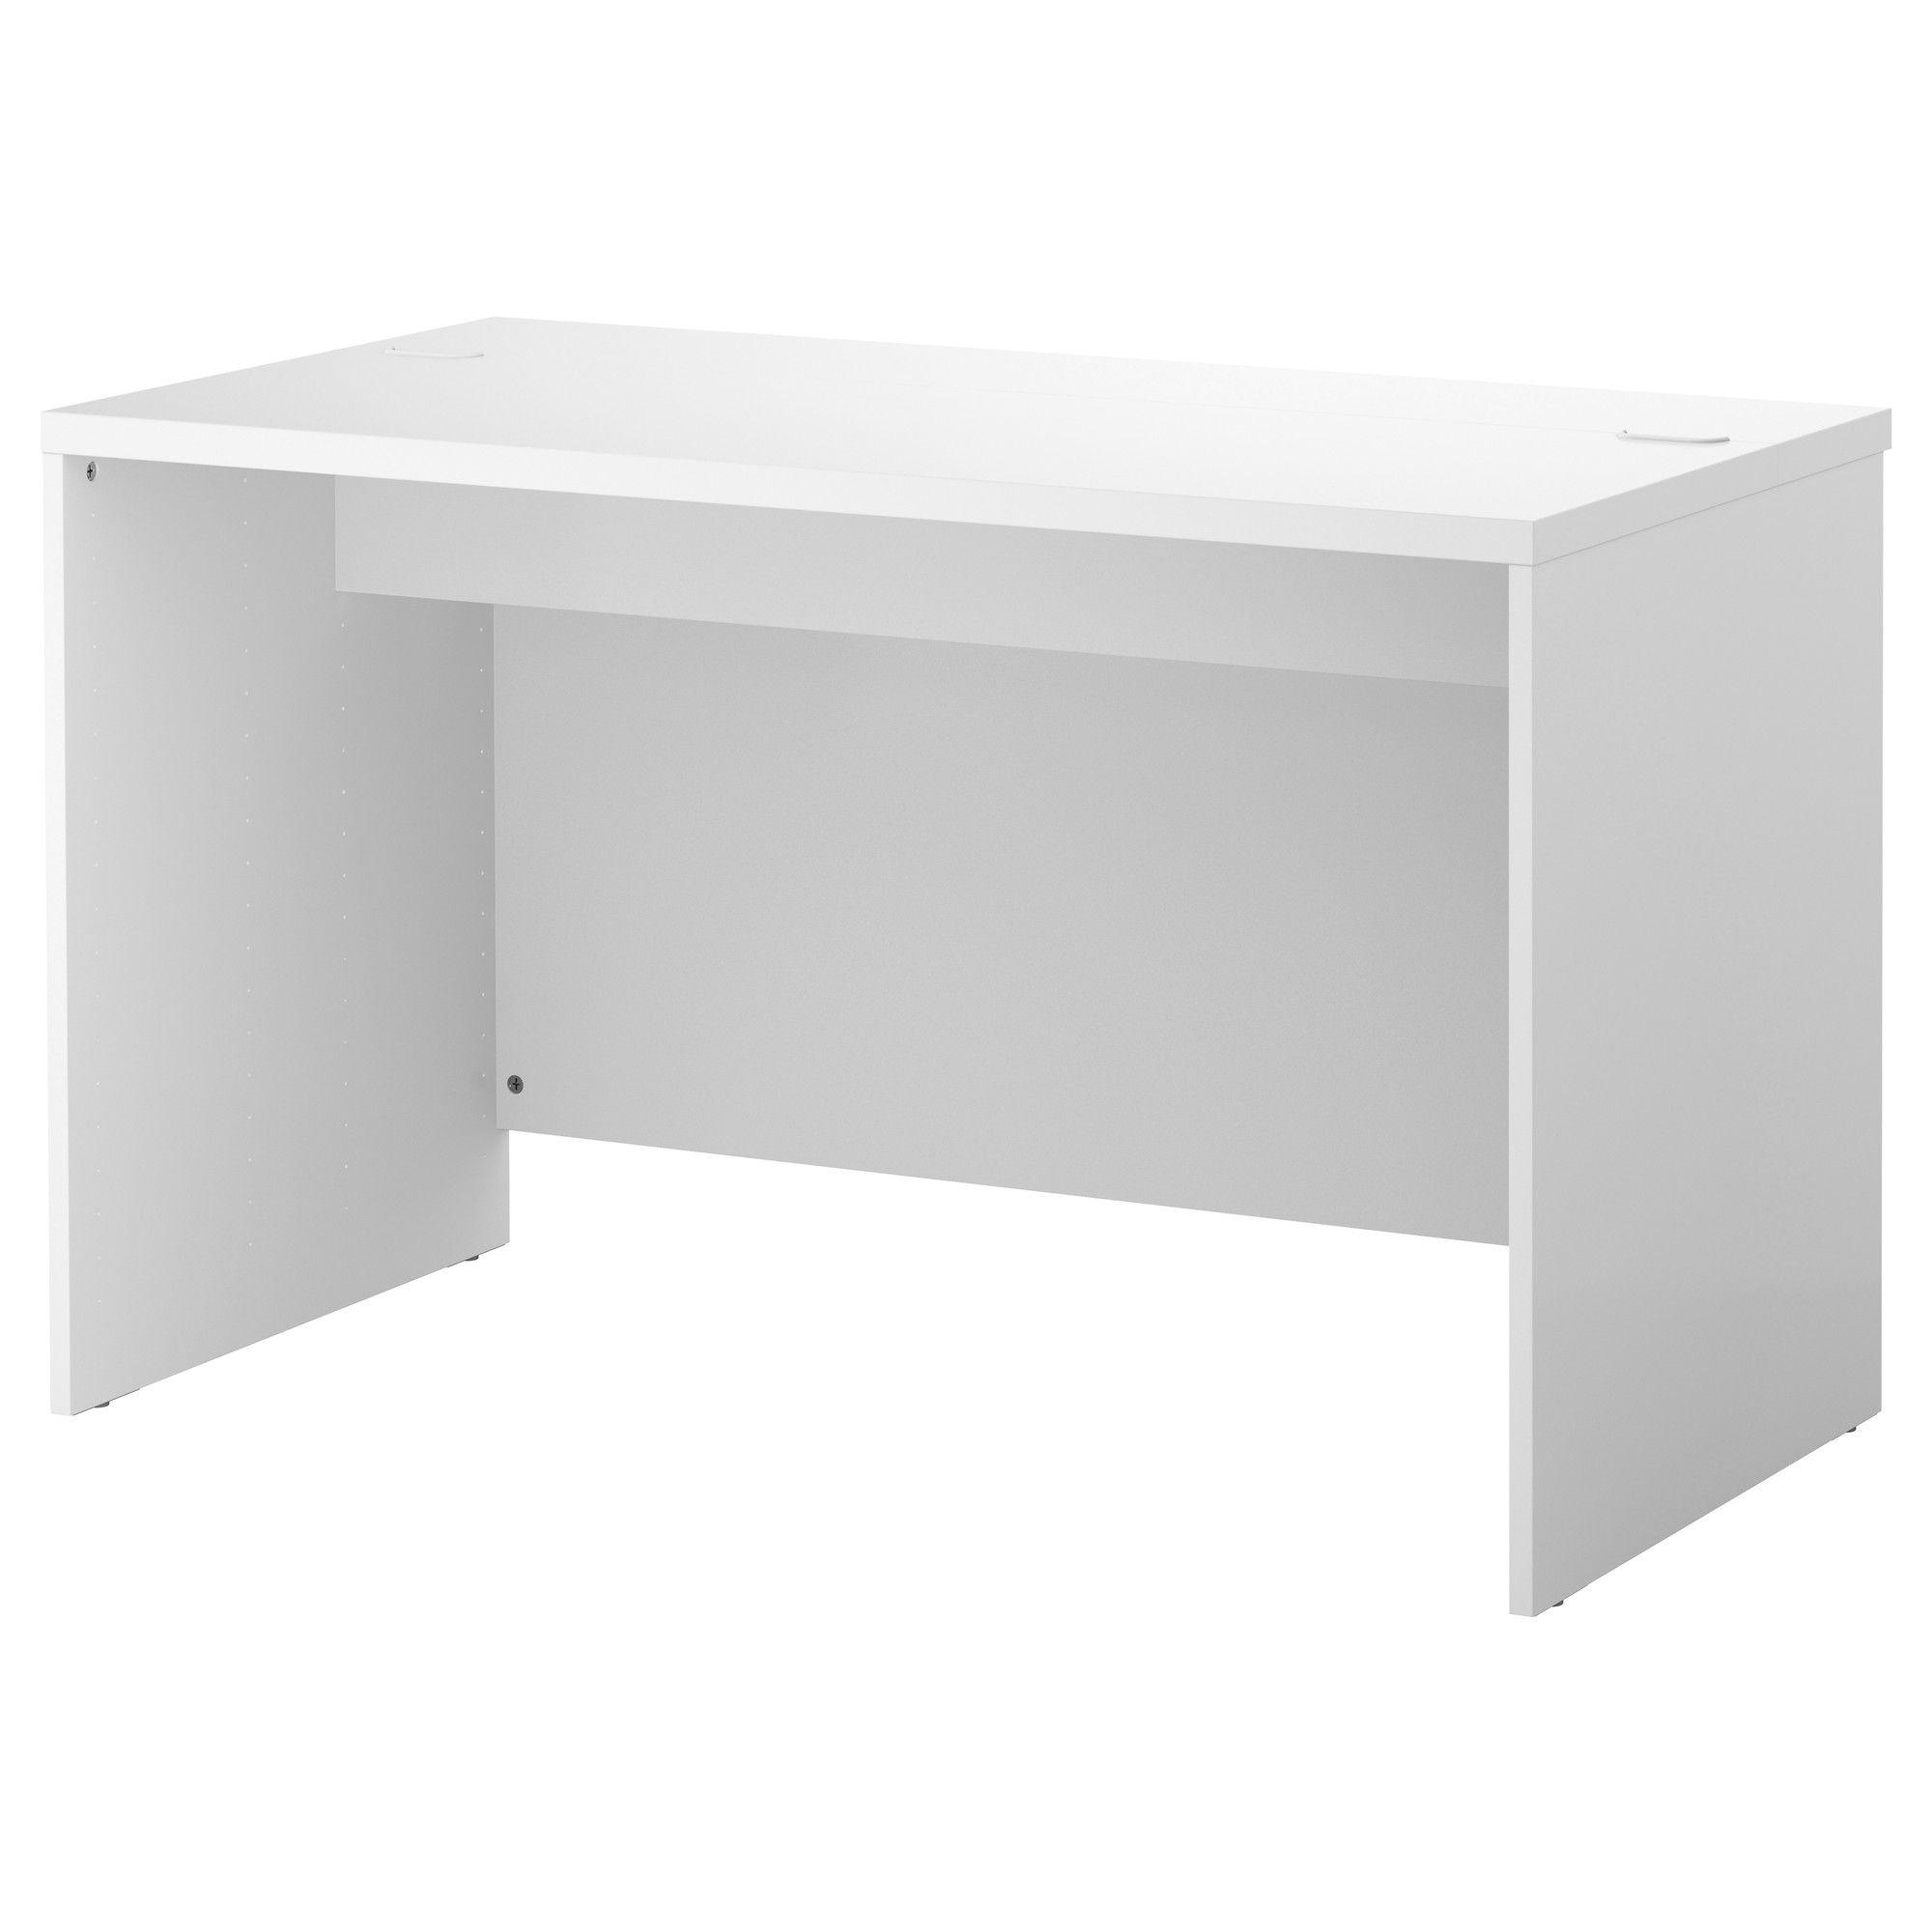 Ikea Us Furniture And Home Furnishings Ikea White Desks Ikea Computer Desk